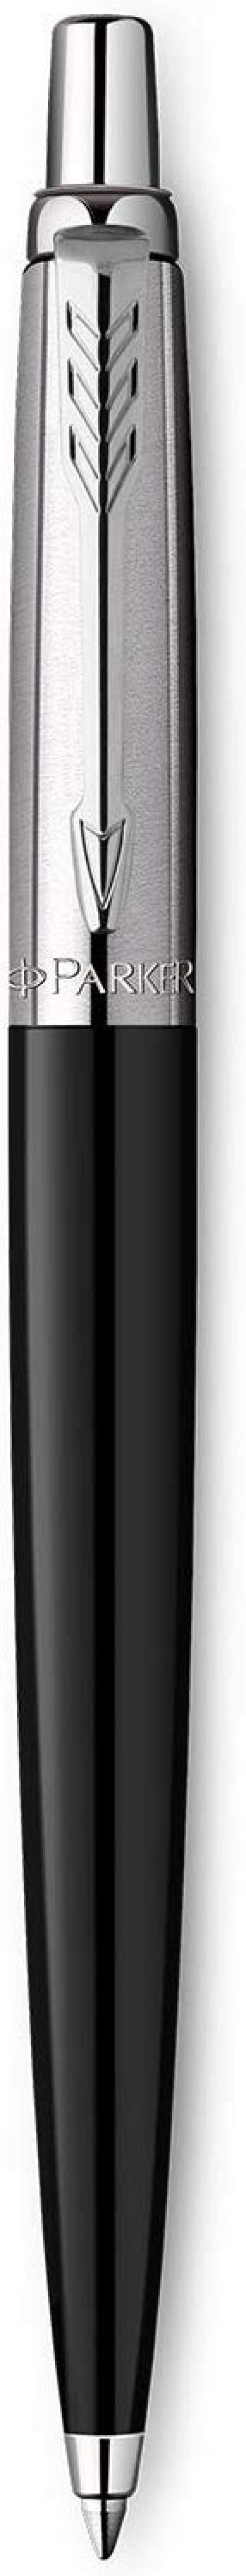 Parker Jotter Ballpoint Pen Black Barrel Blue Ink